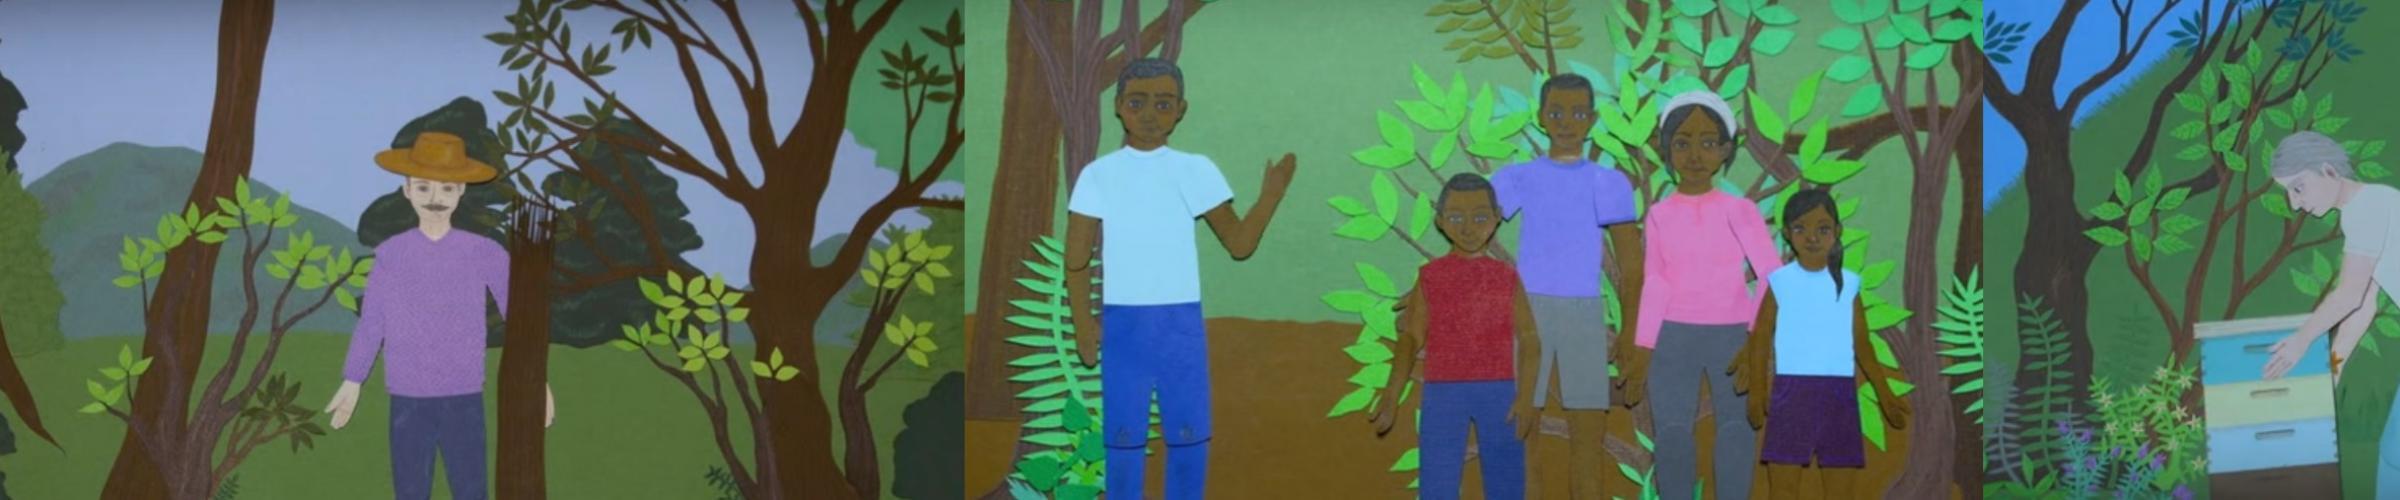 Sankofa - Storytelling for the digital age